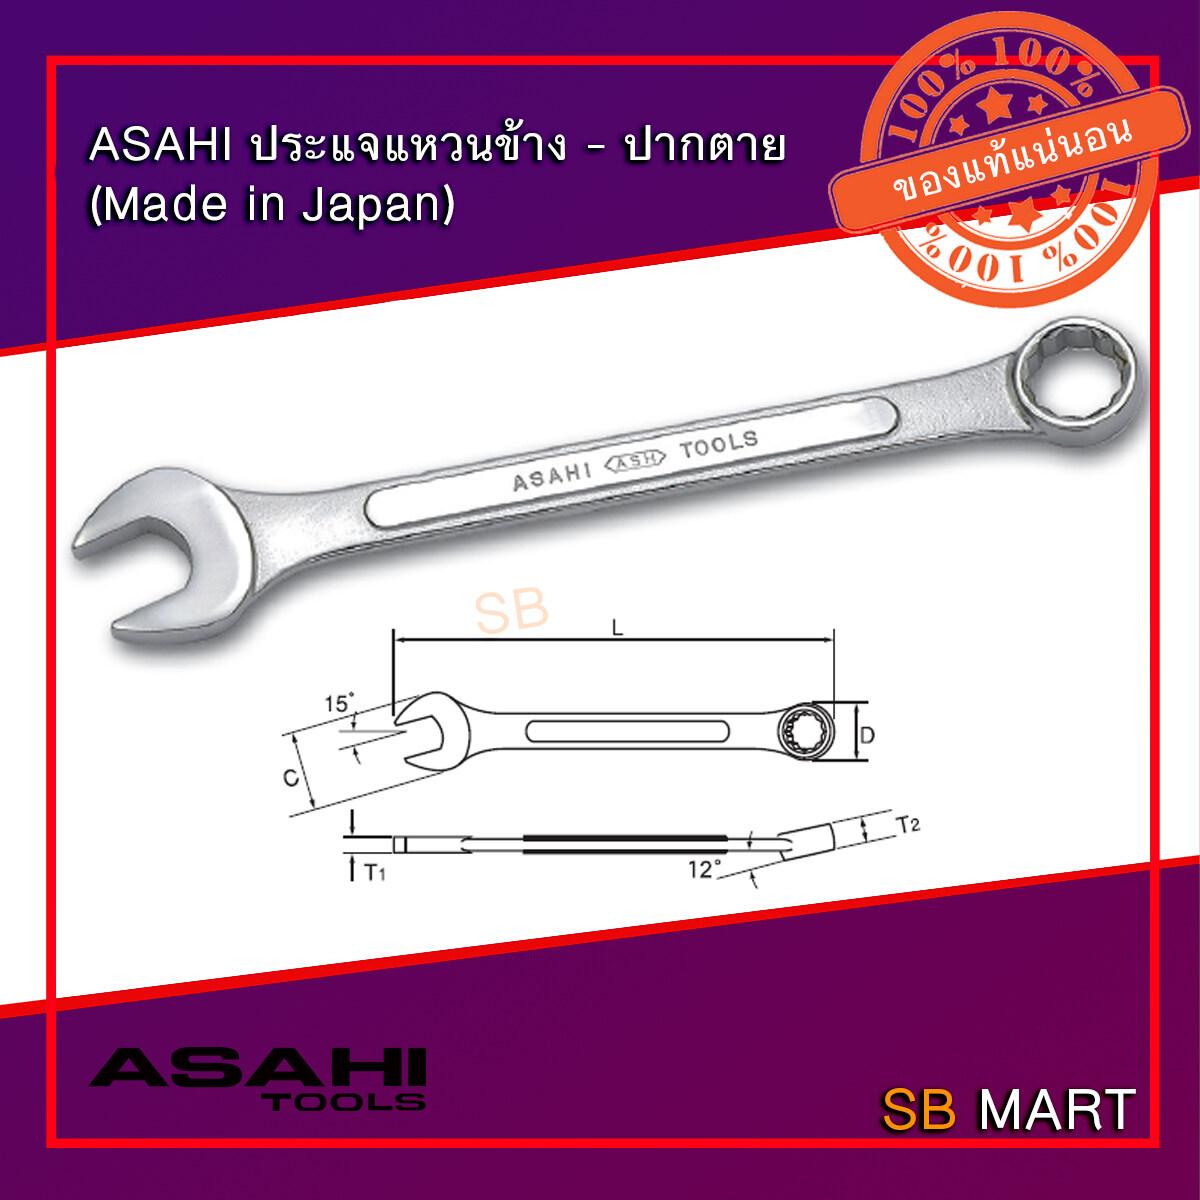 ASAHI ประแจแหวนข้าง - ปากตาย (Made in Japna) มิล เบอร์ 6 - 32 มิล